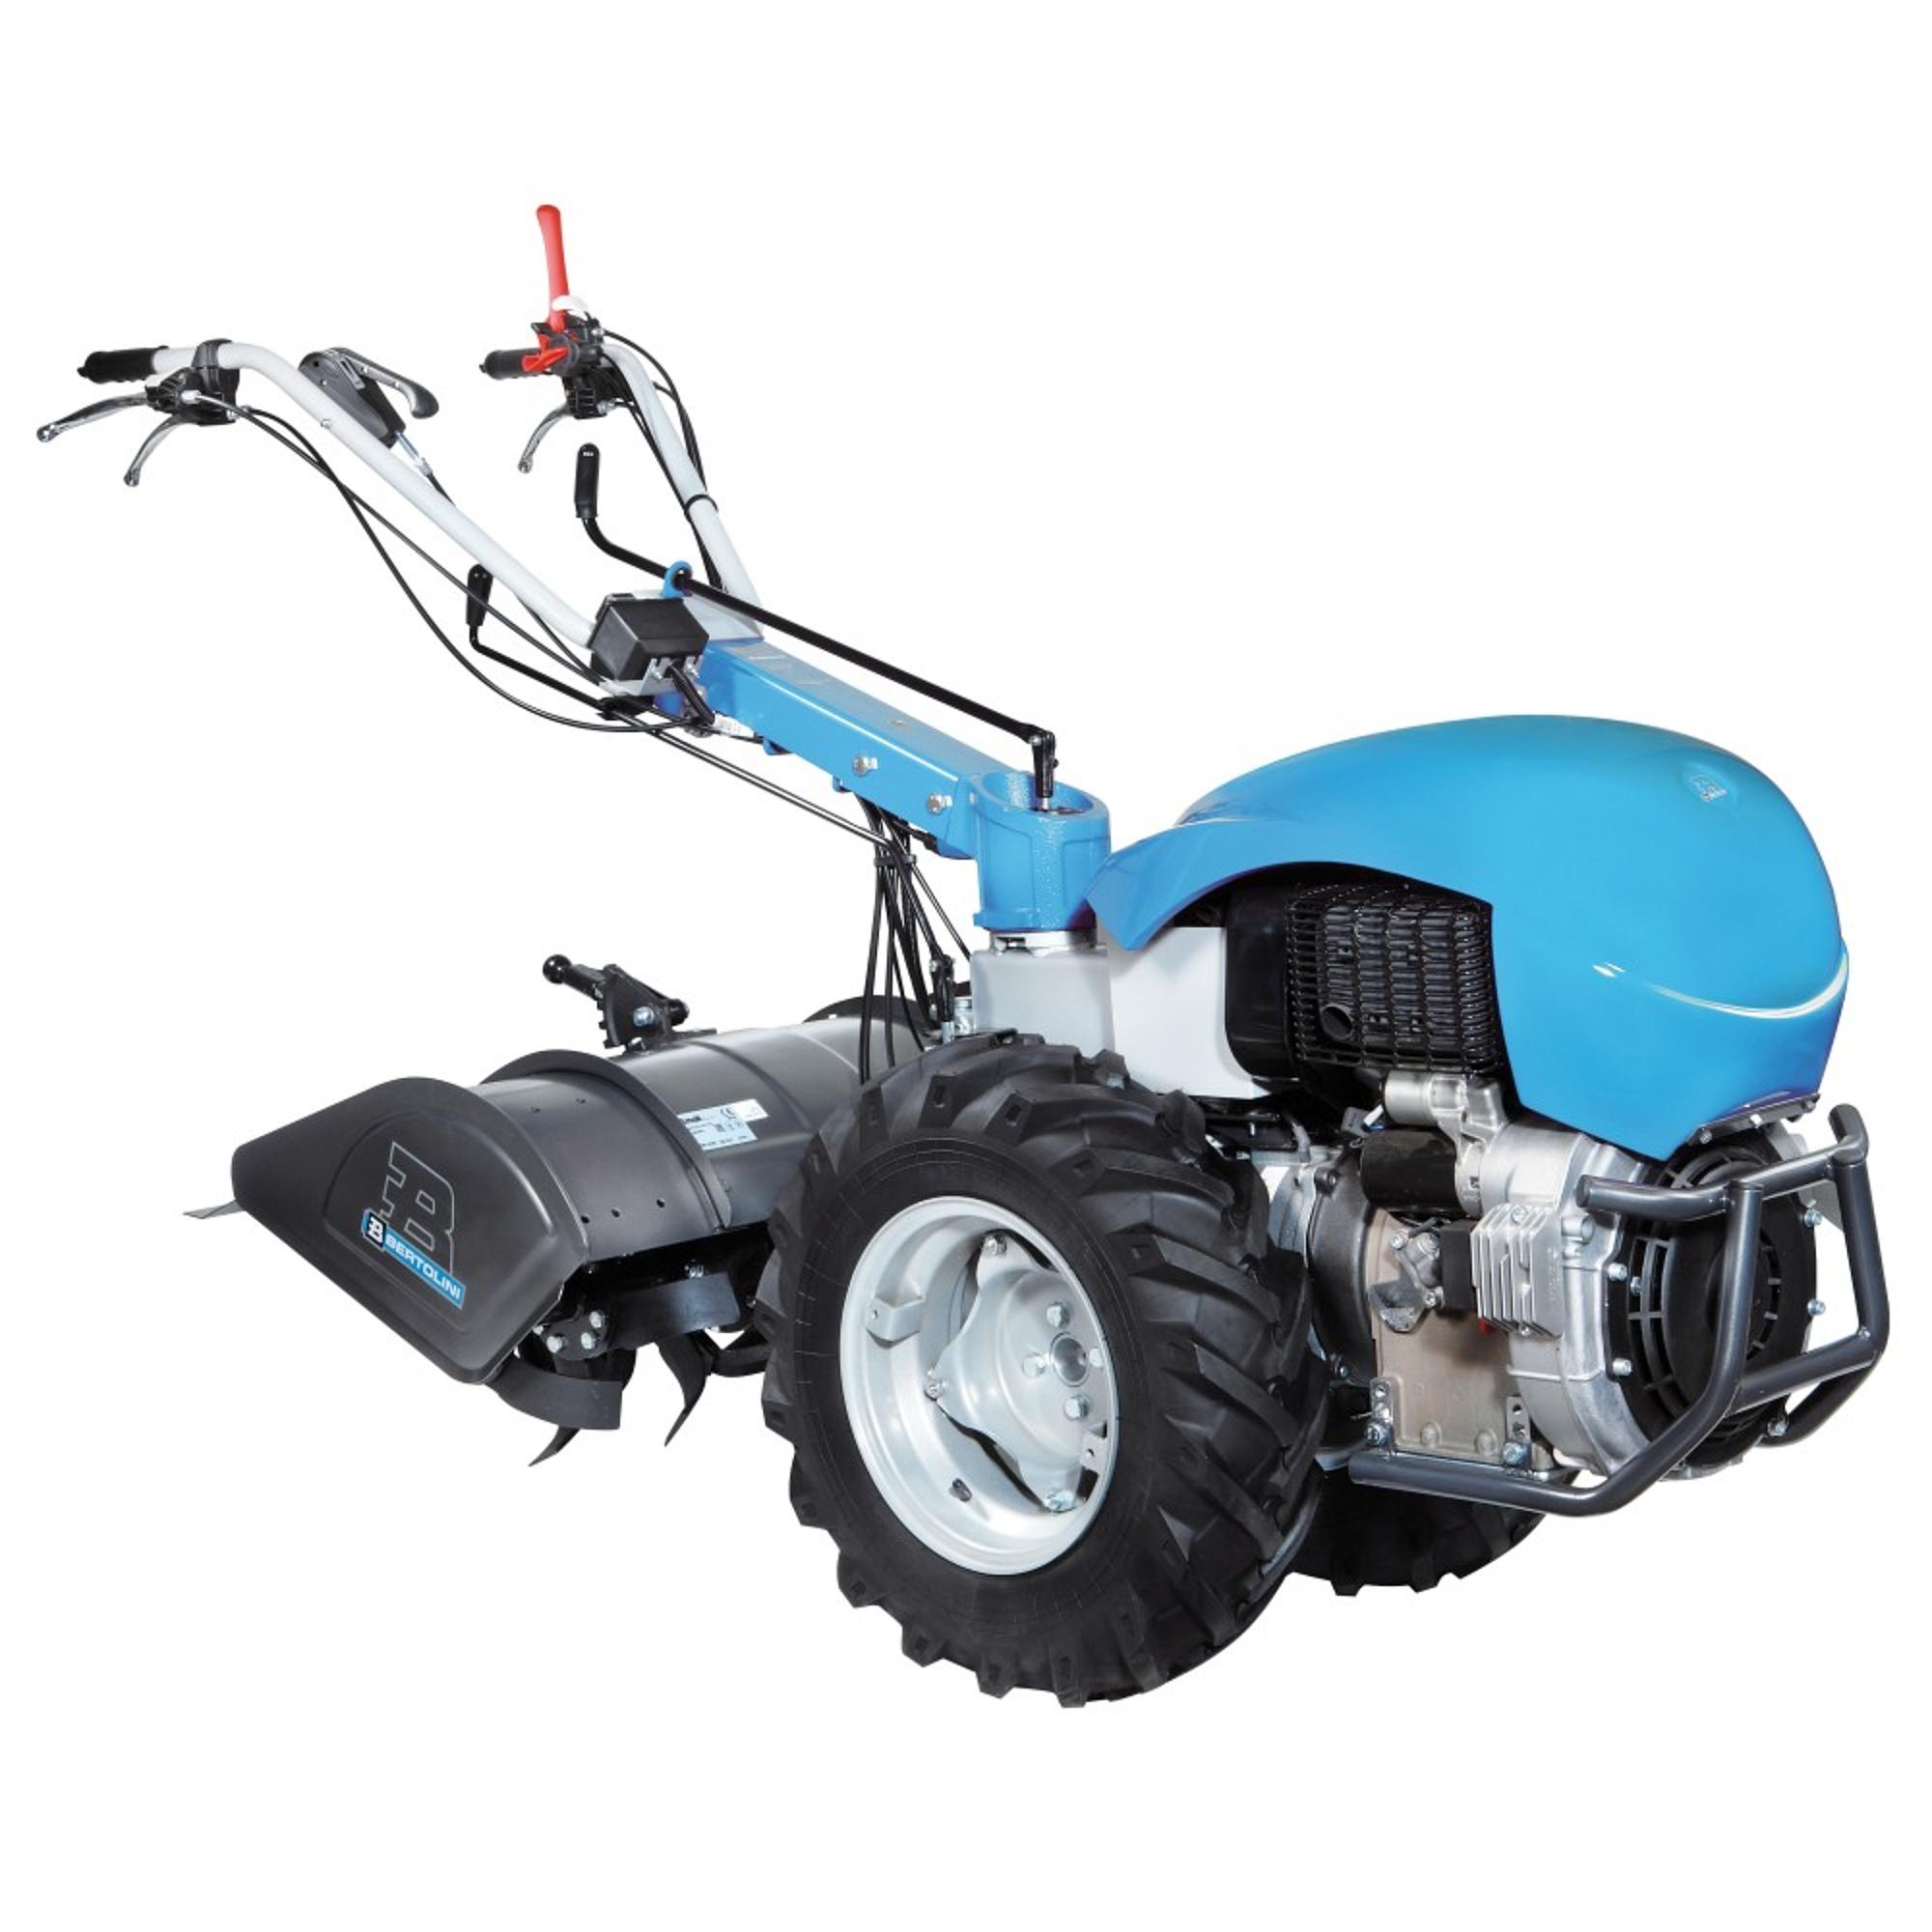 Bertolini Kultivátor Alapgép BT 417 S Lombardini 15LD510 motorral 68339102EN